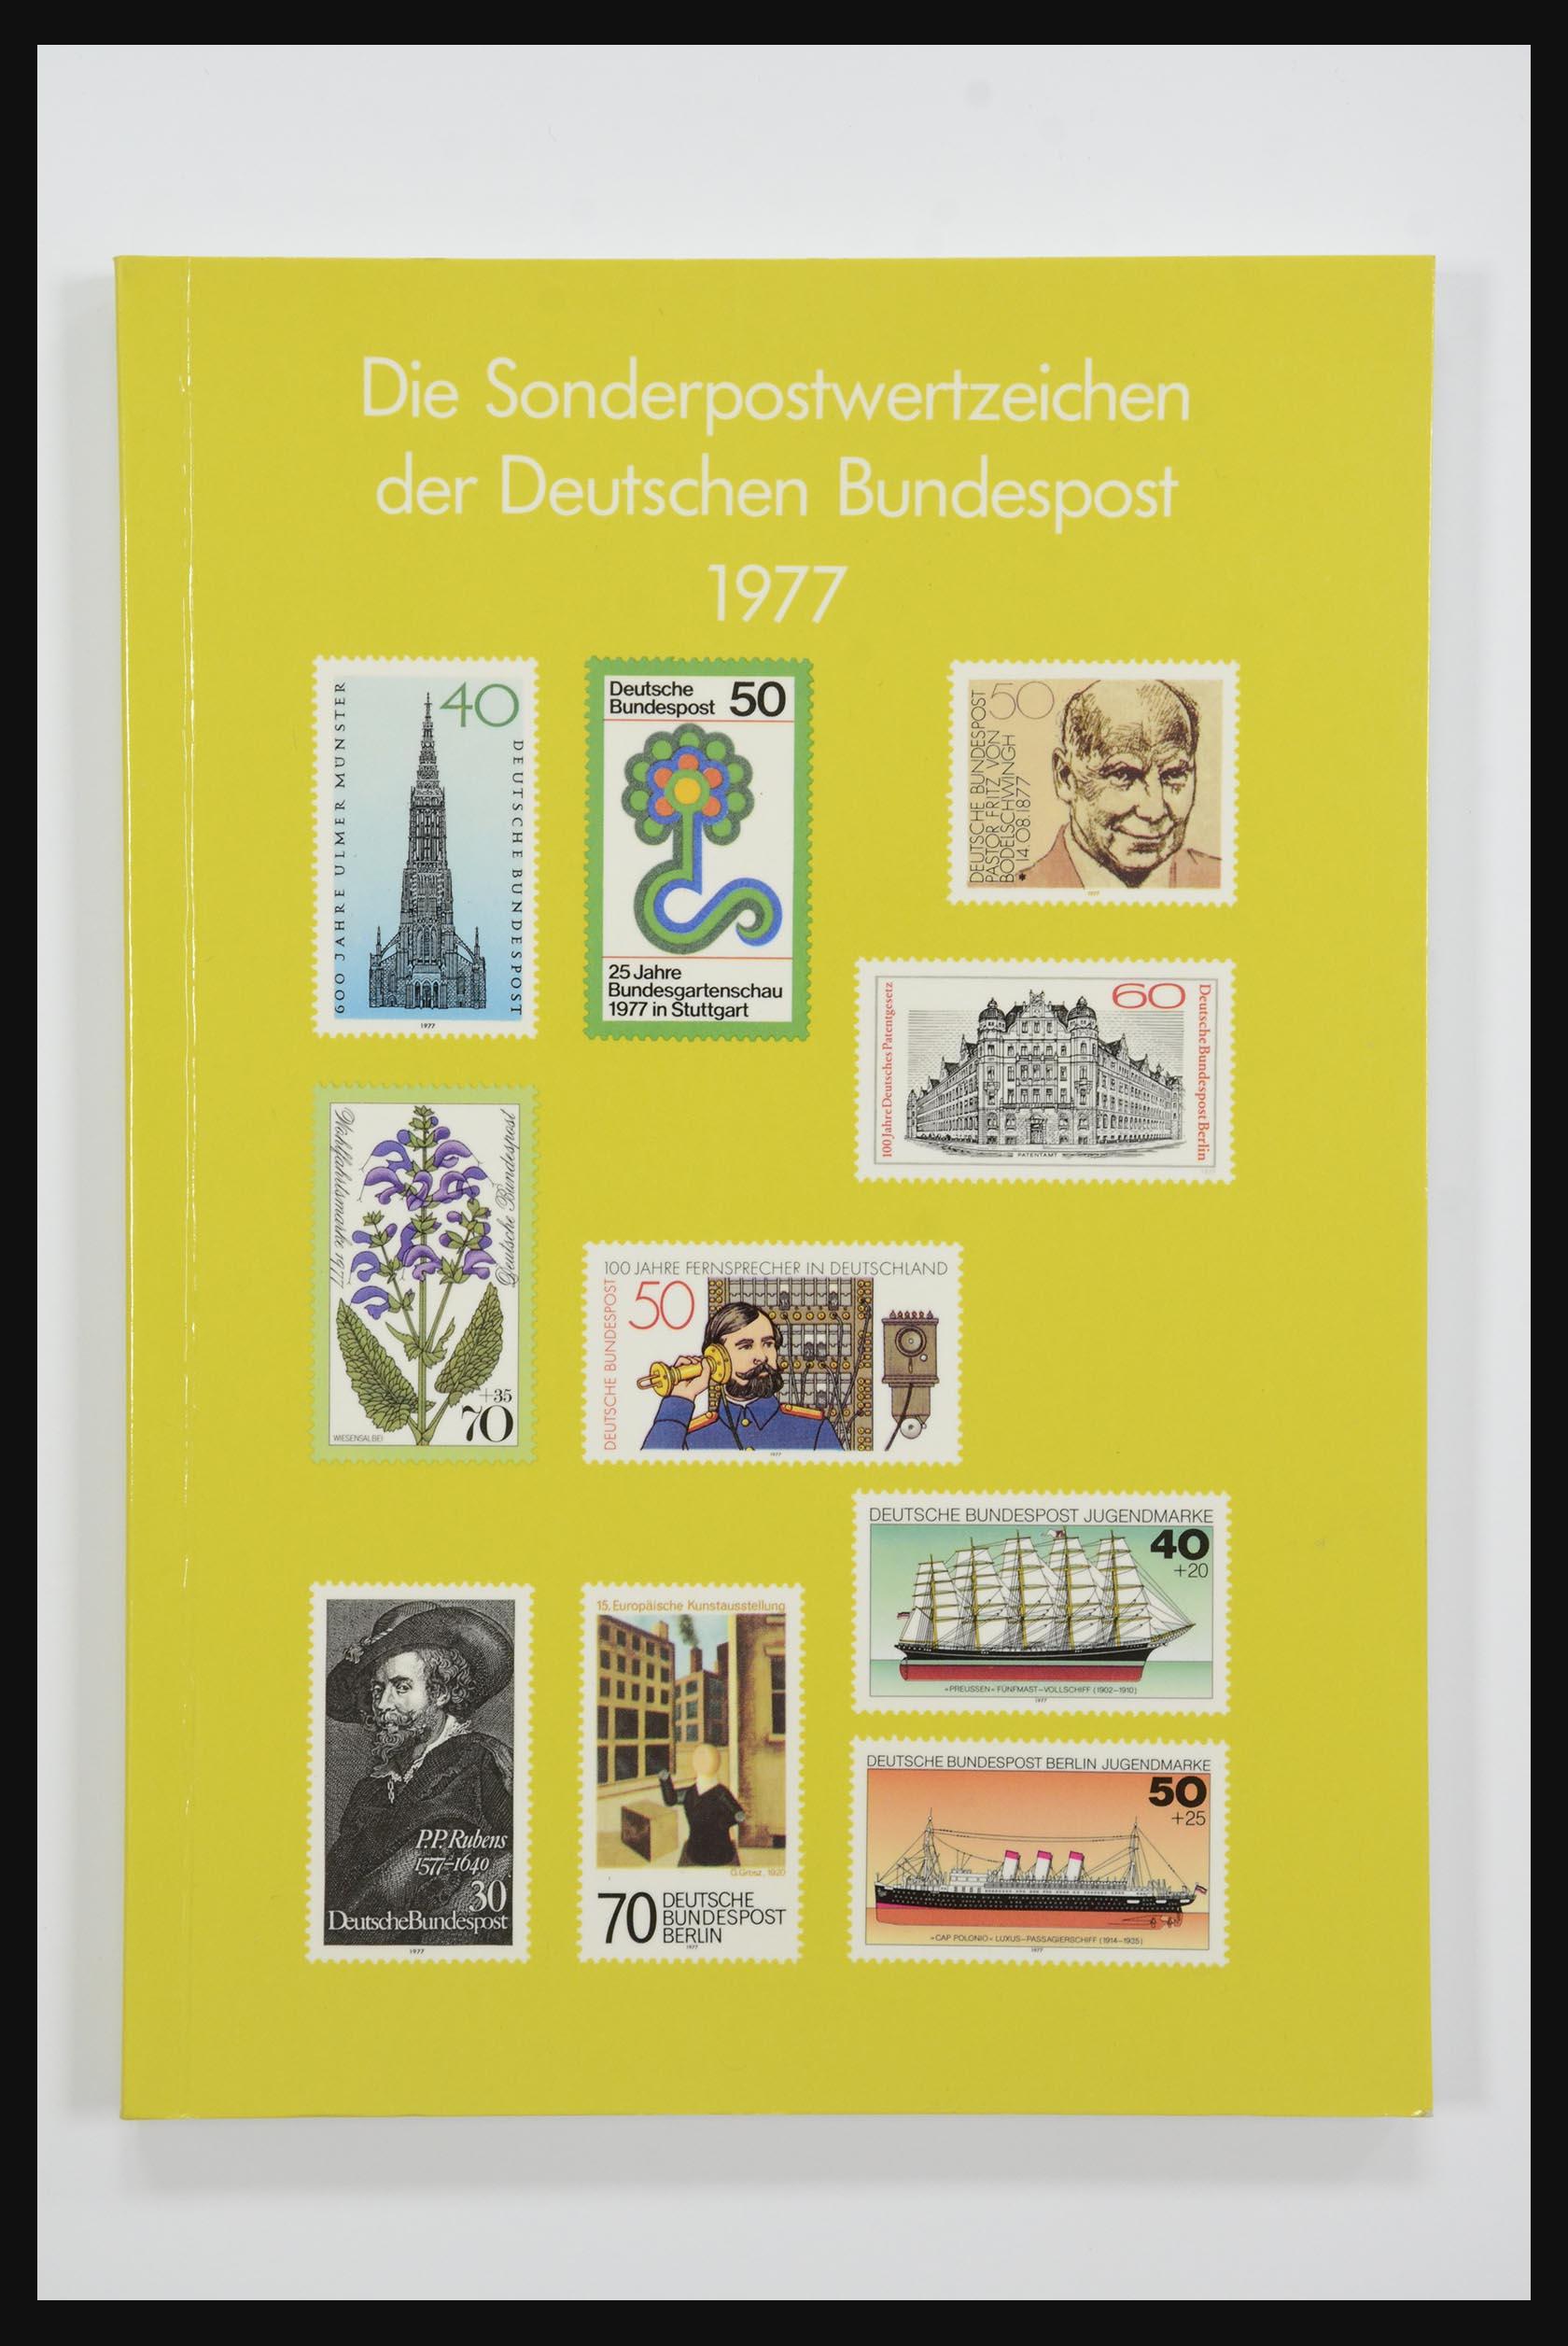 31834 005 - 31834 Bundespost yearbooks 1973(!)-1999.